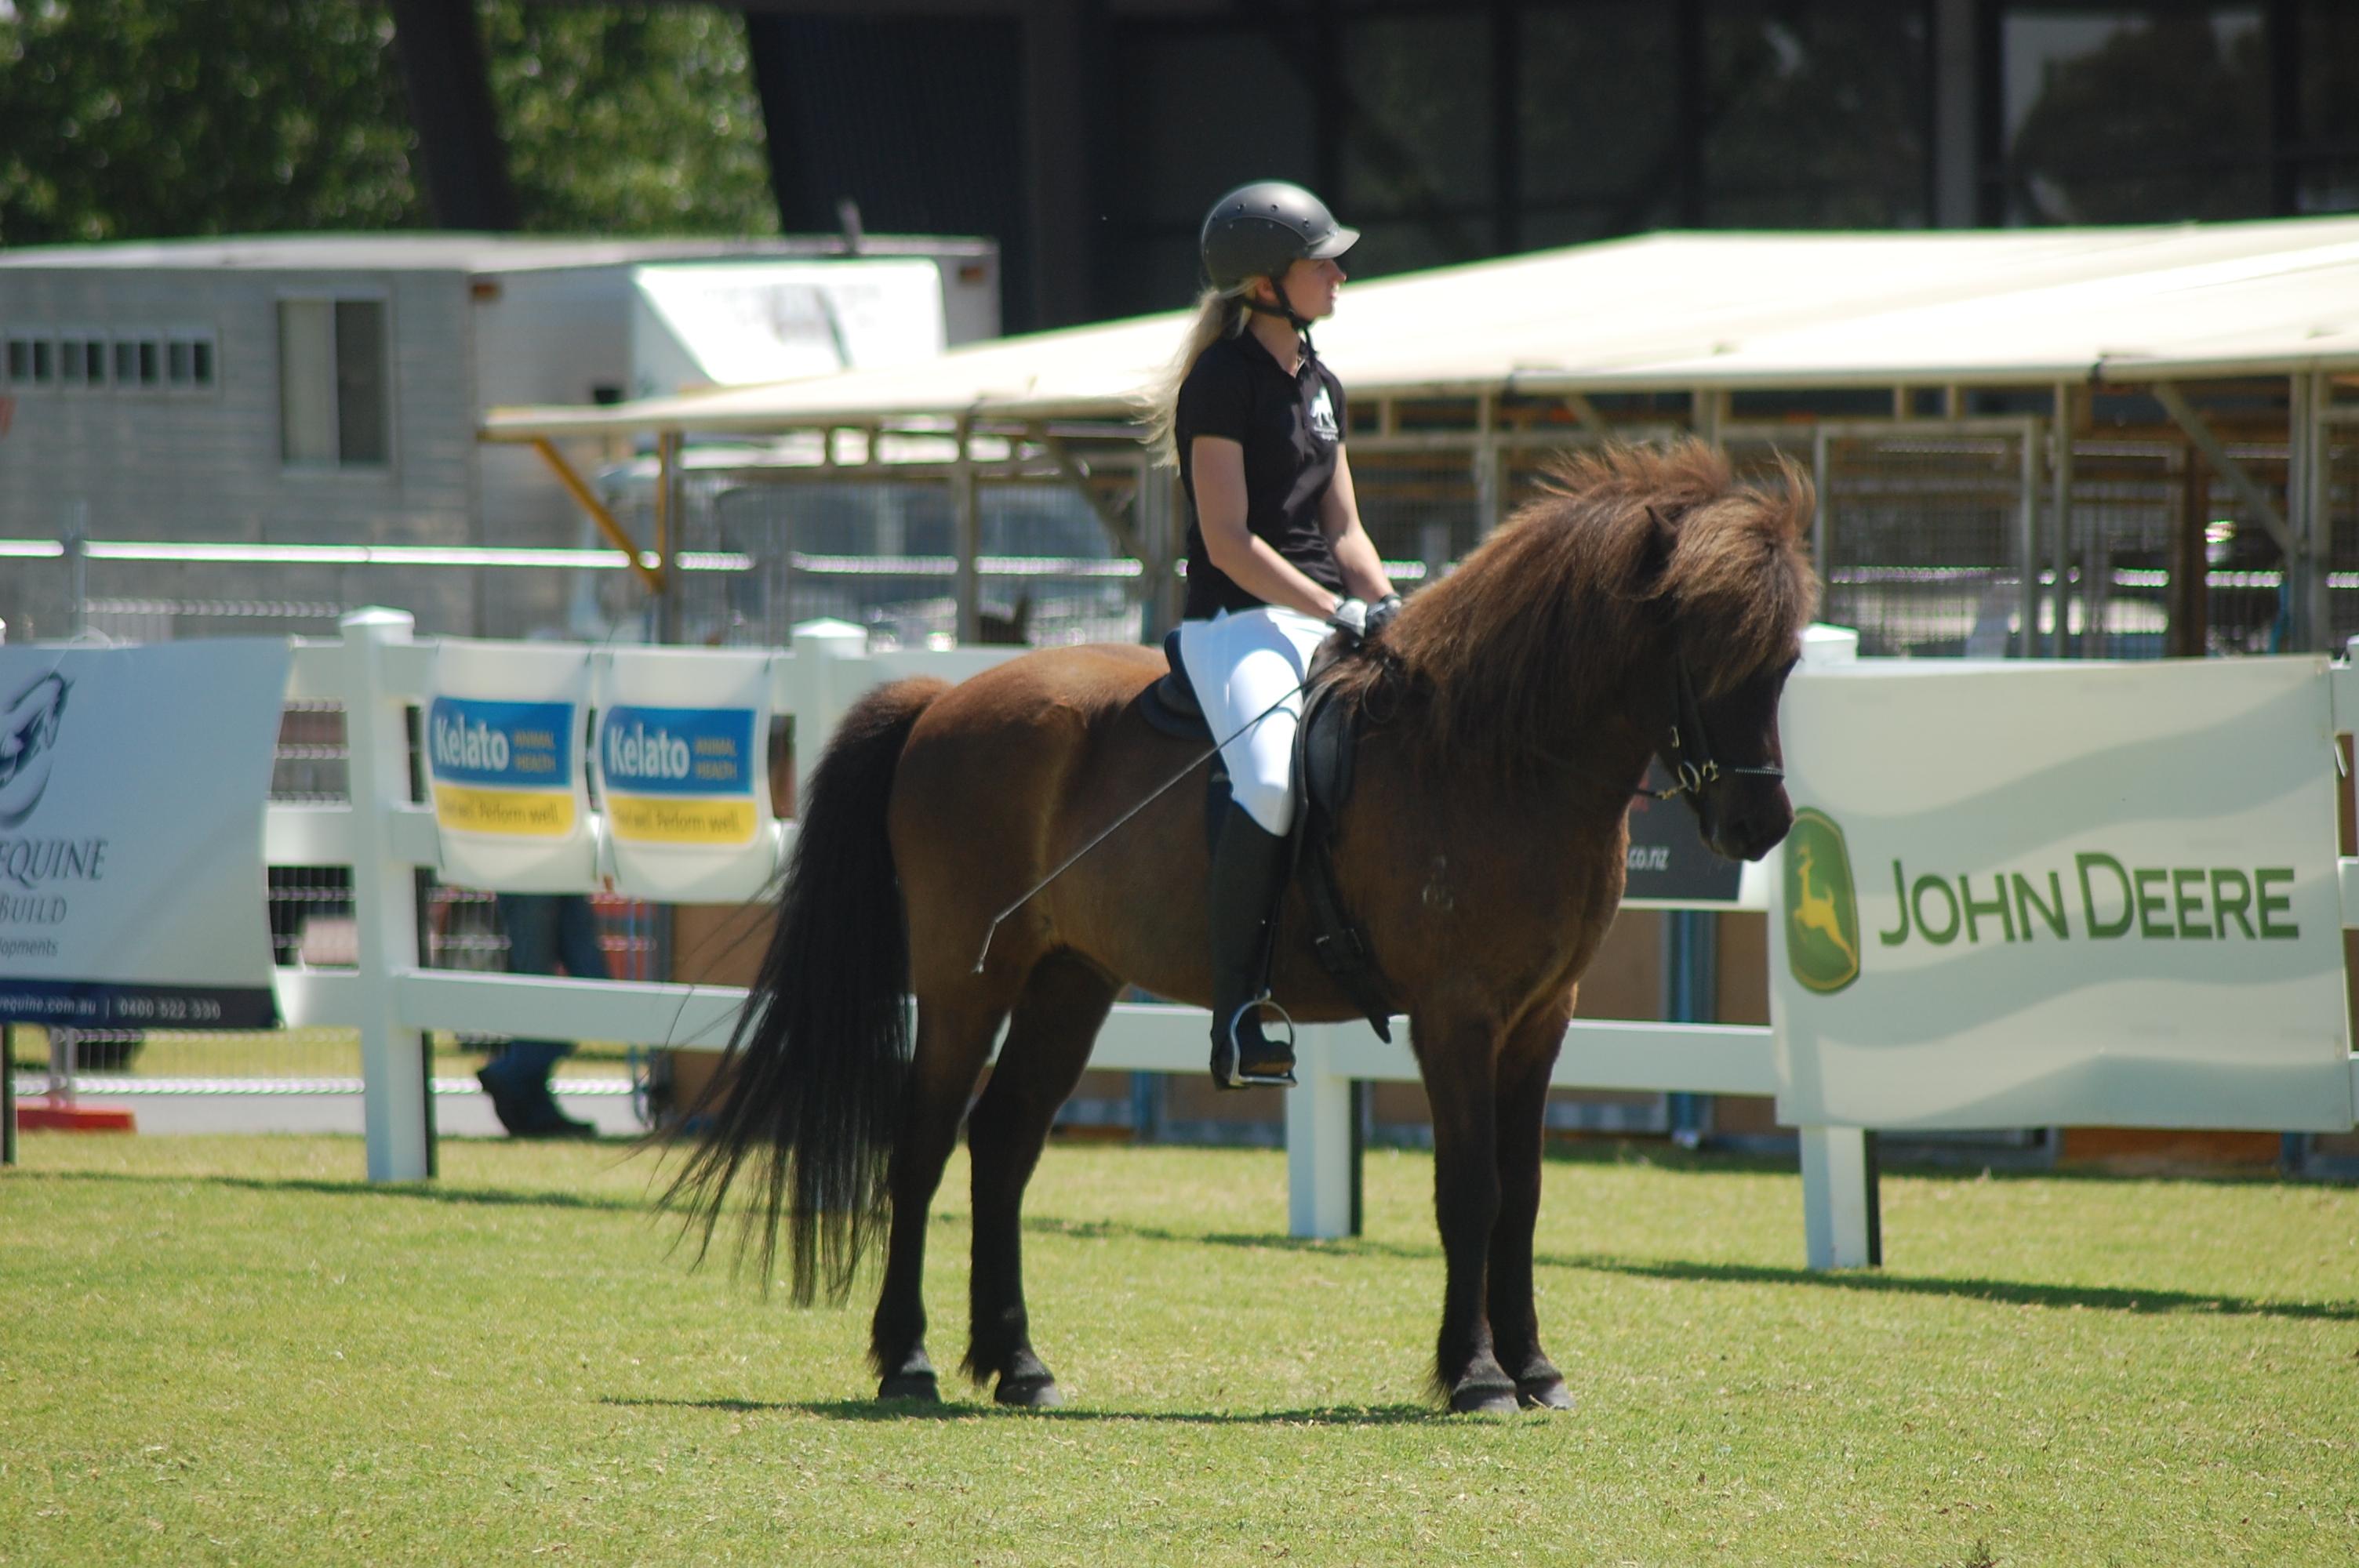 Equitana 2016, Falinn